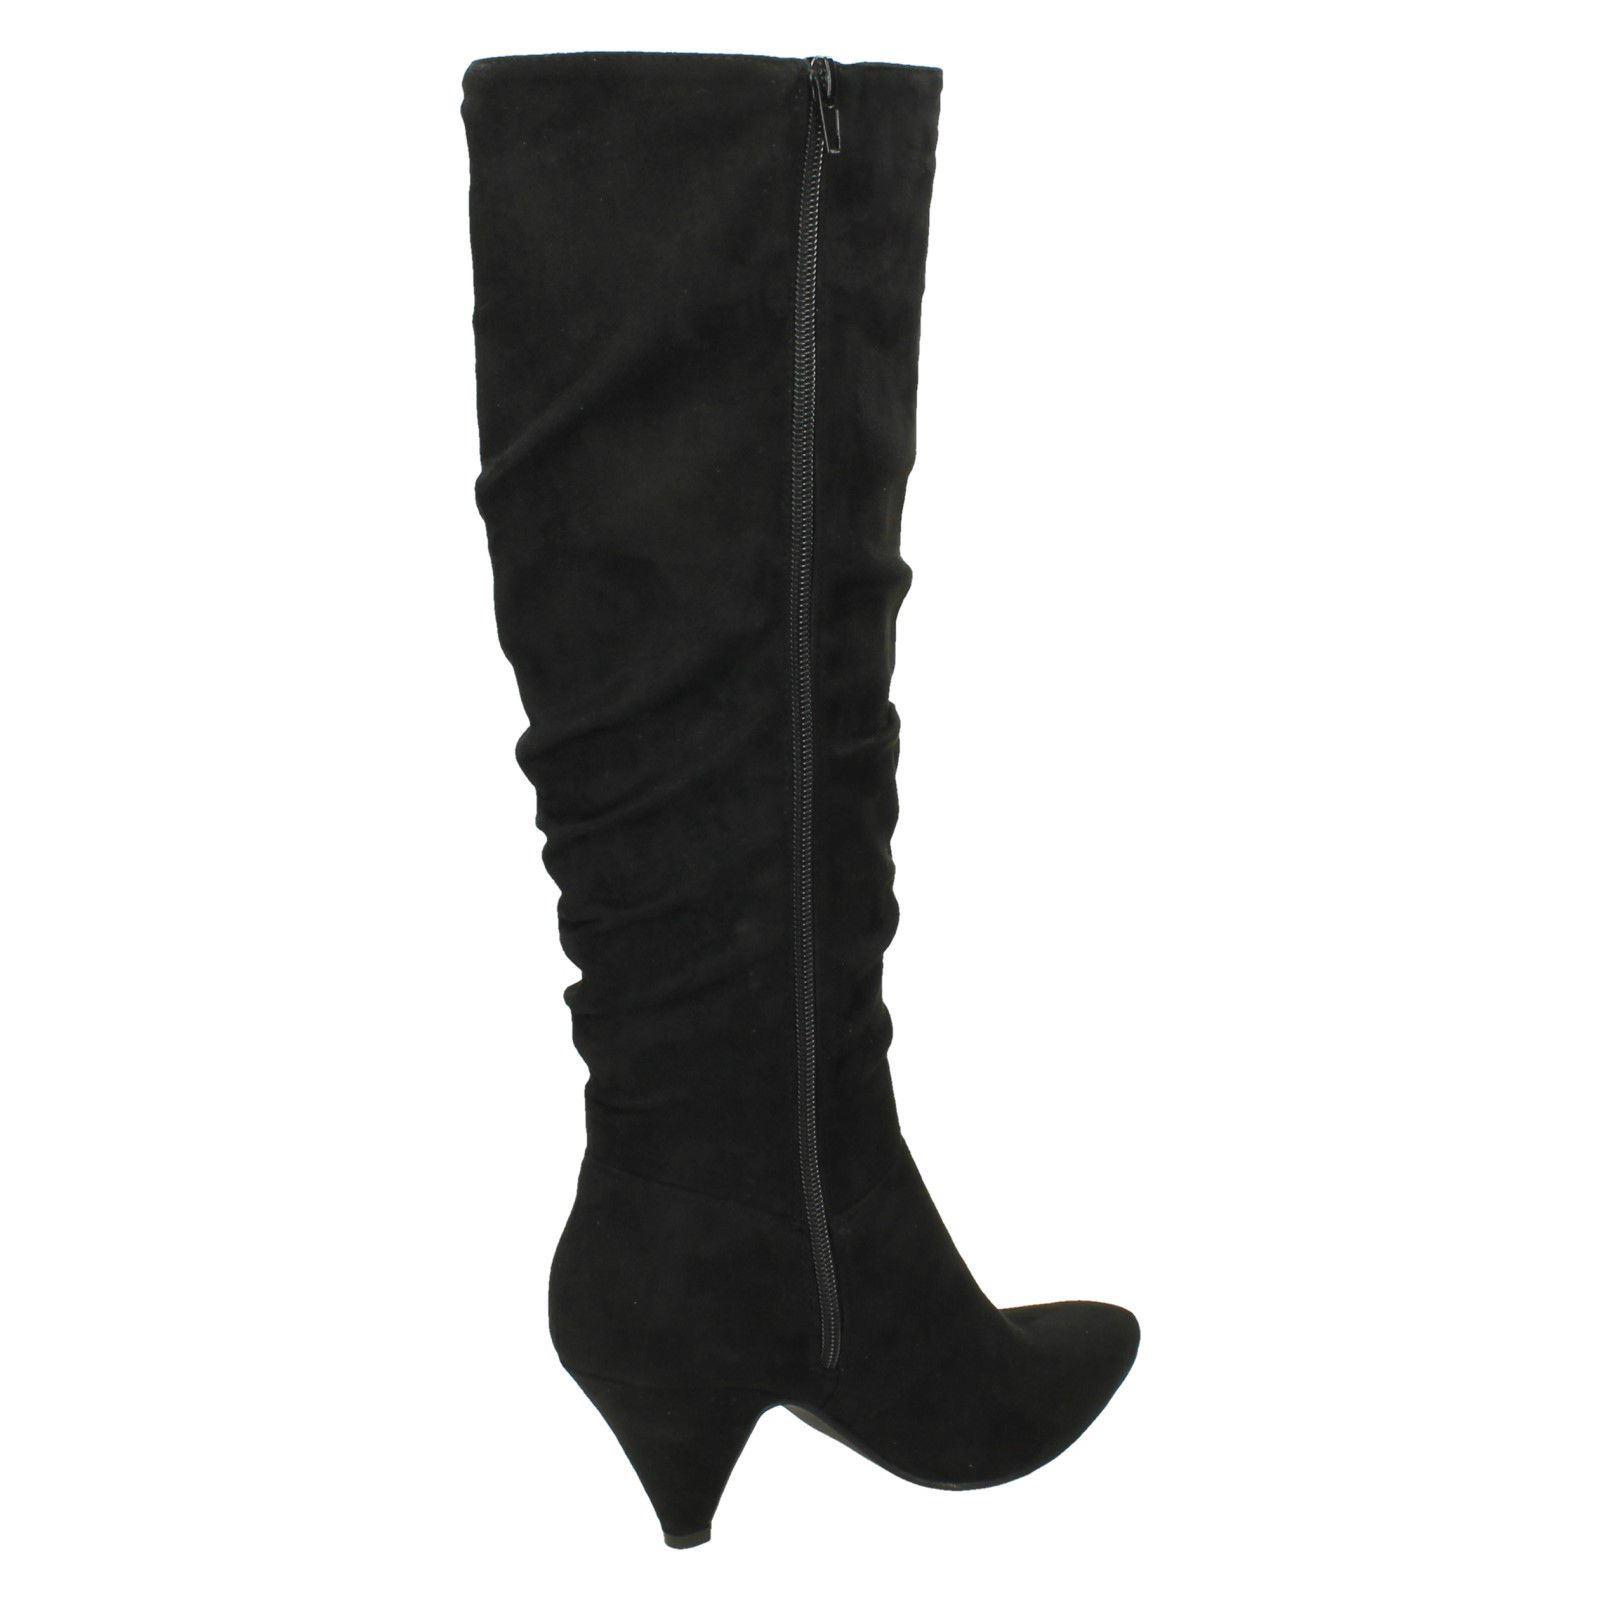 Ladies Spot Knee Boots ~n High Style F5r0898 On Black rPrqpwdfg